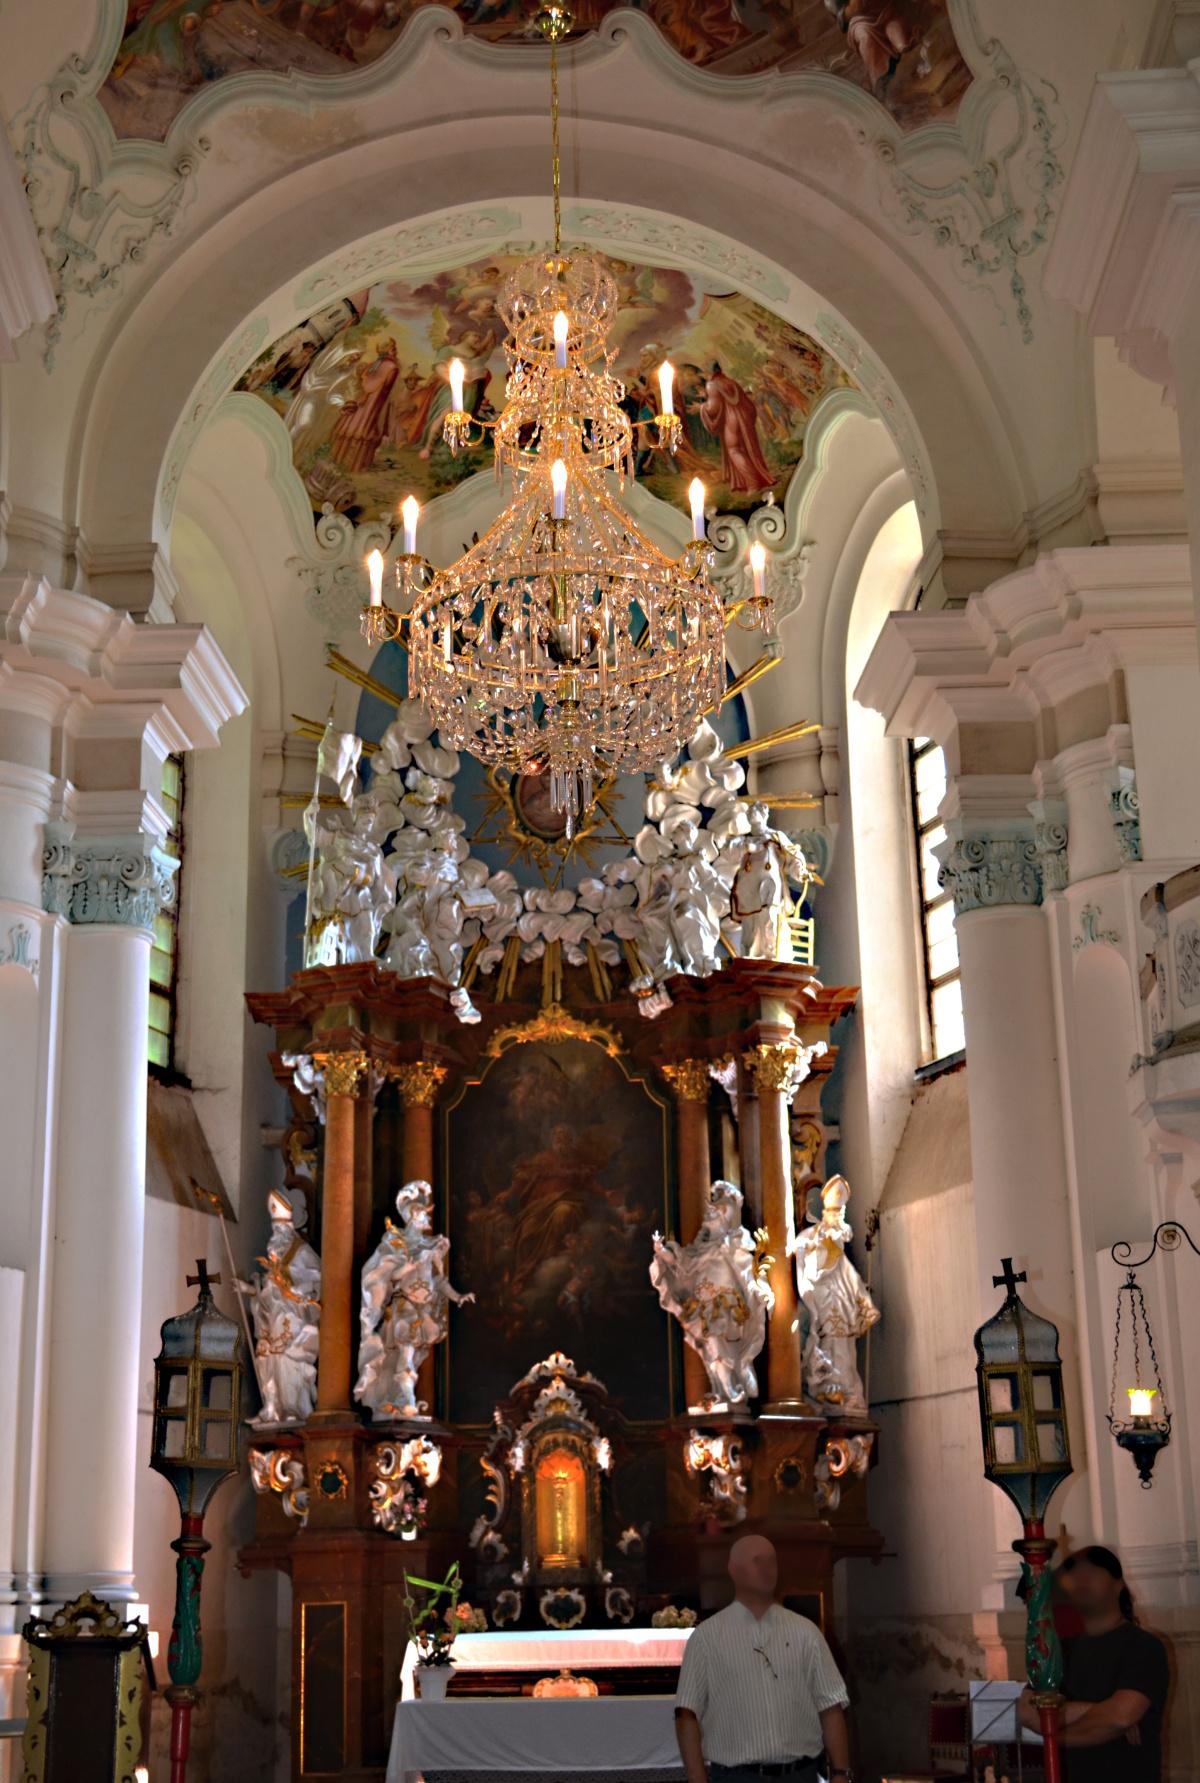 renovation-chandelier-pistov-4.jpg